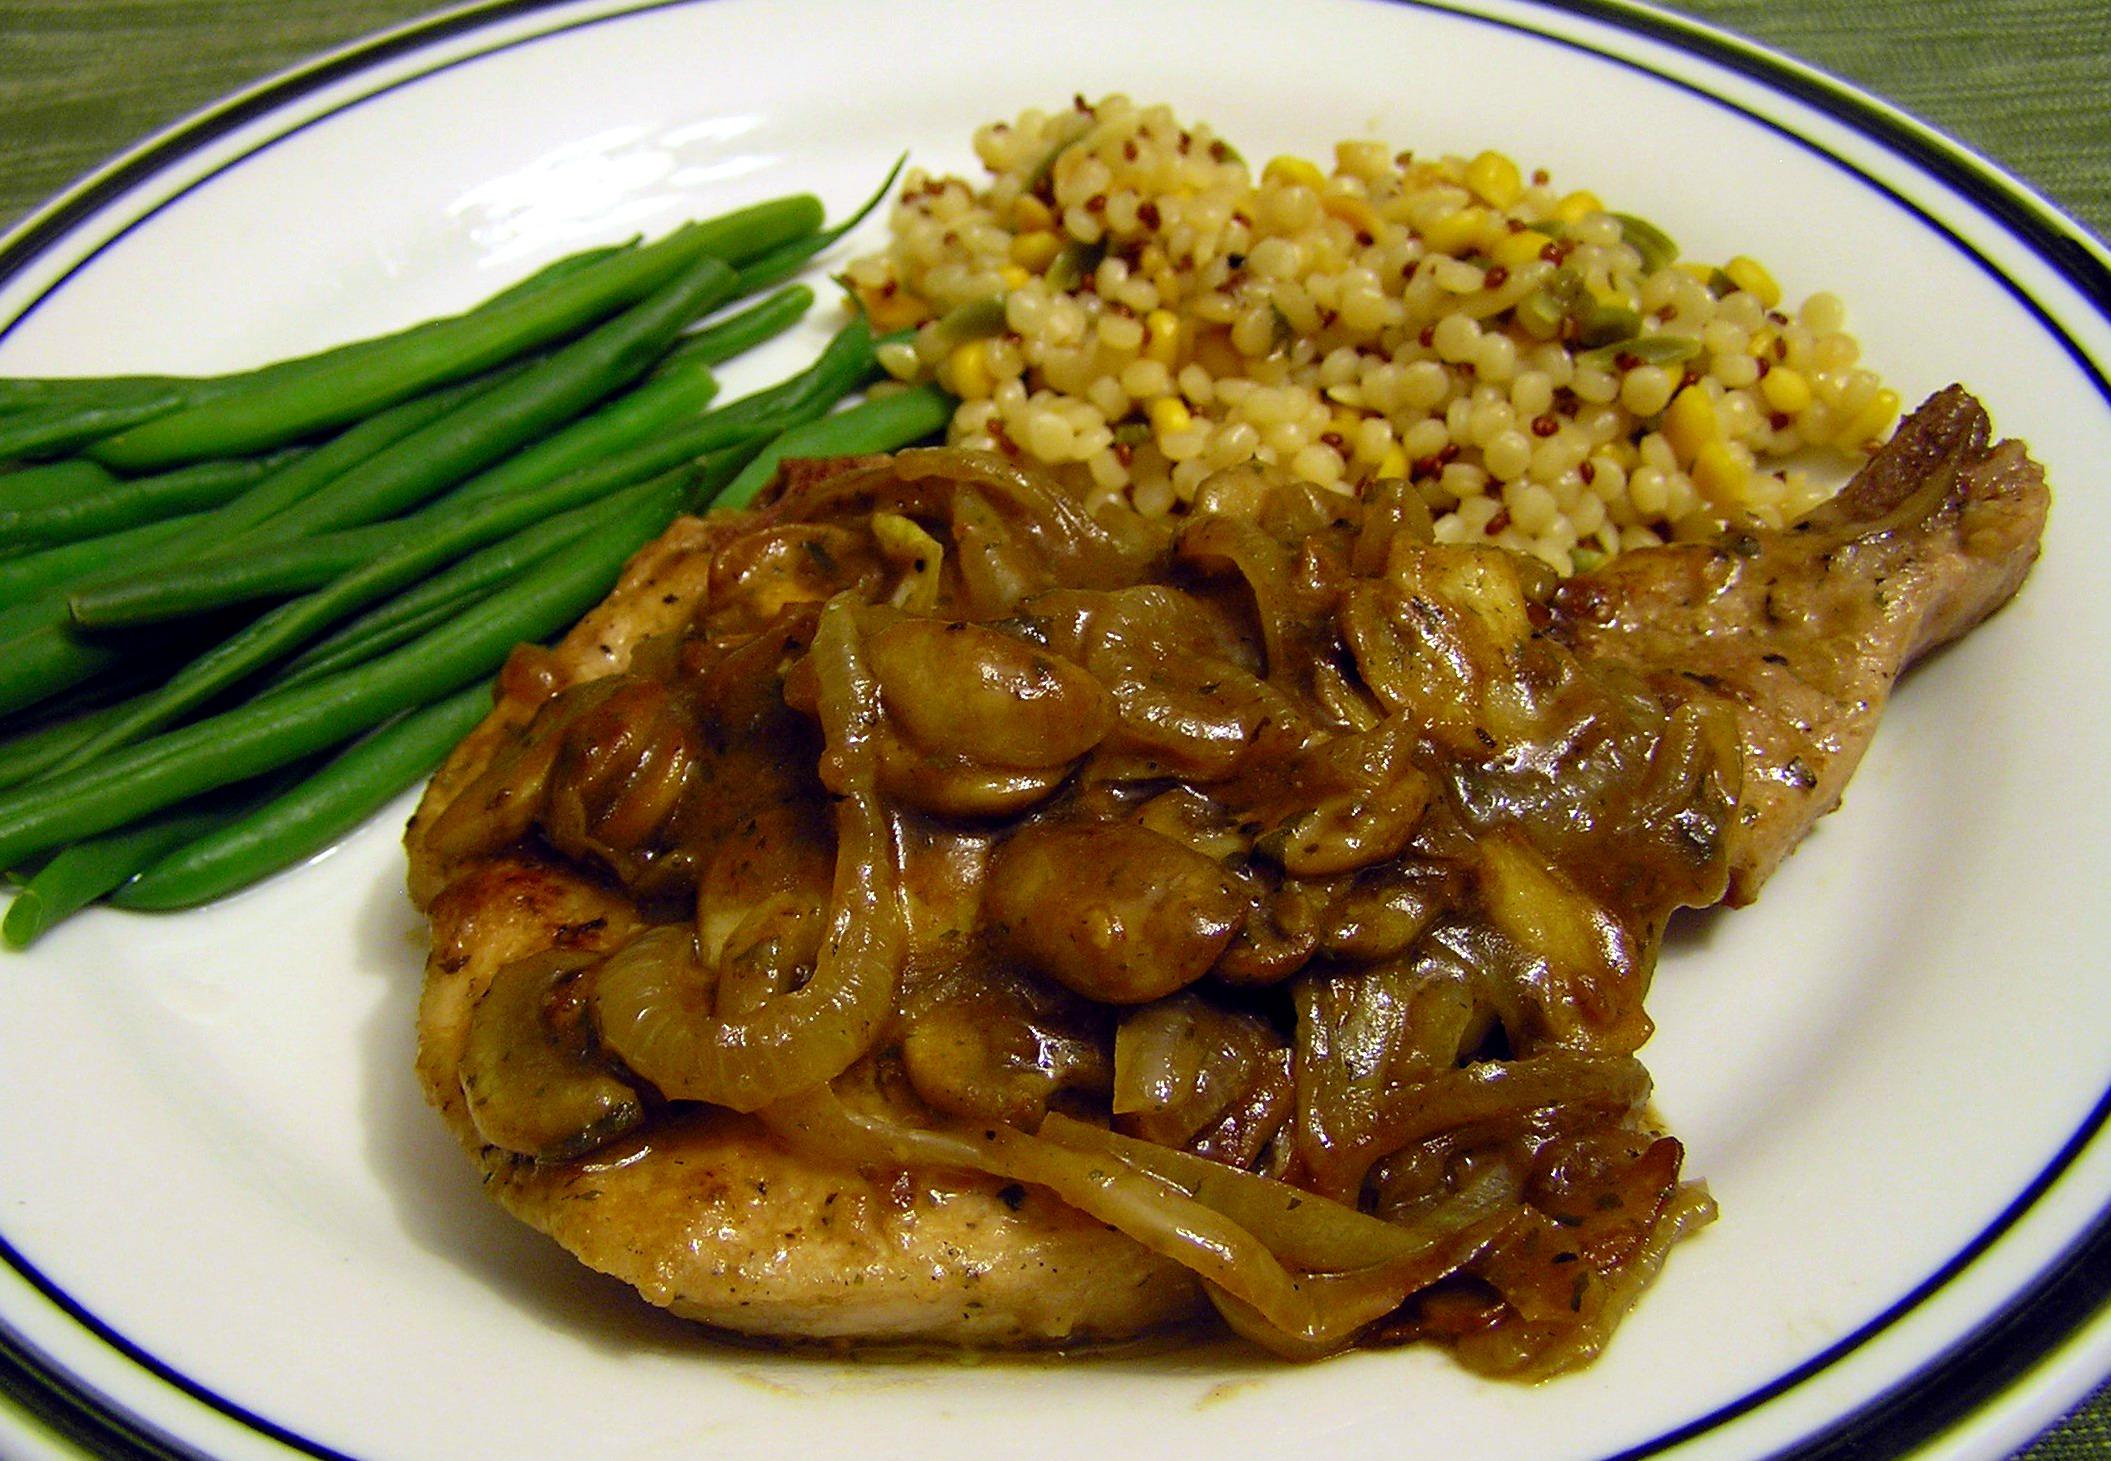 Caramelized Onion and Mushroom Balsamic Gravy over Pork ...